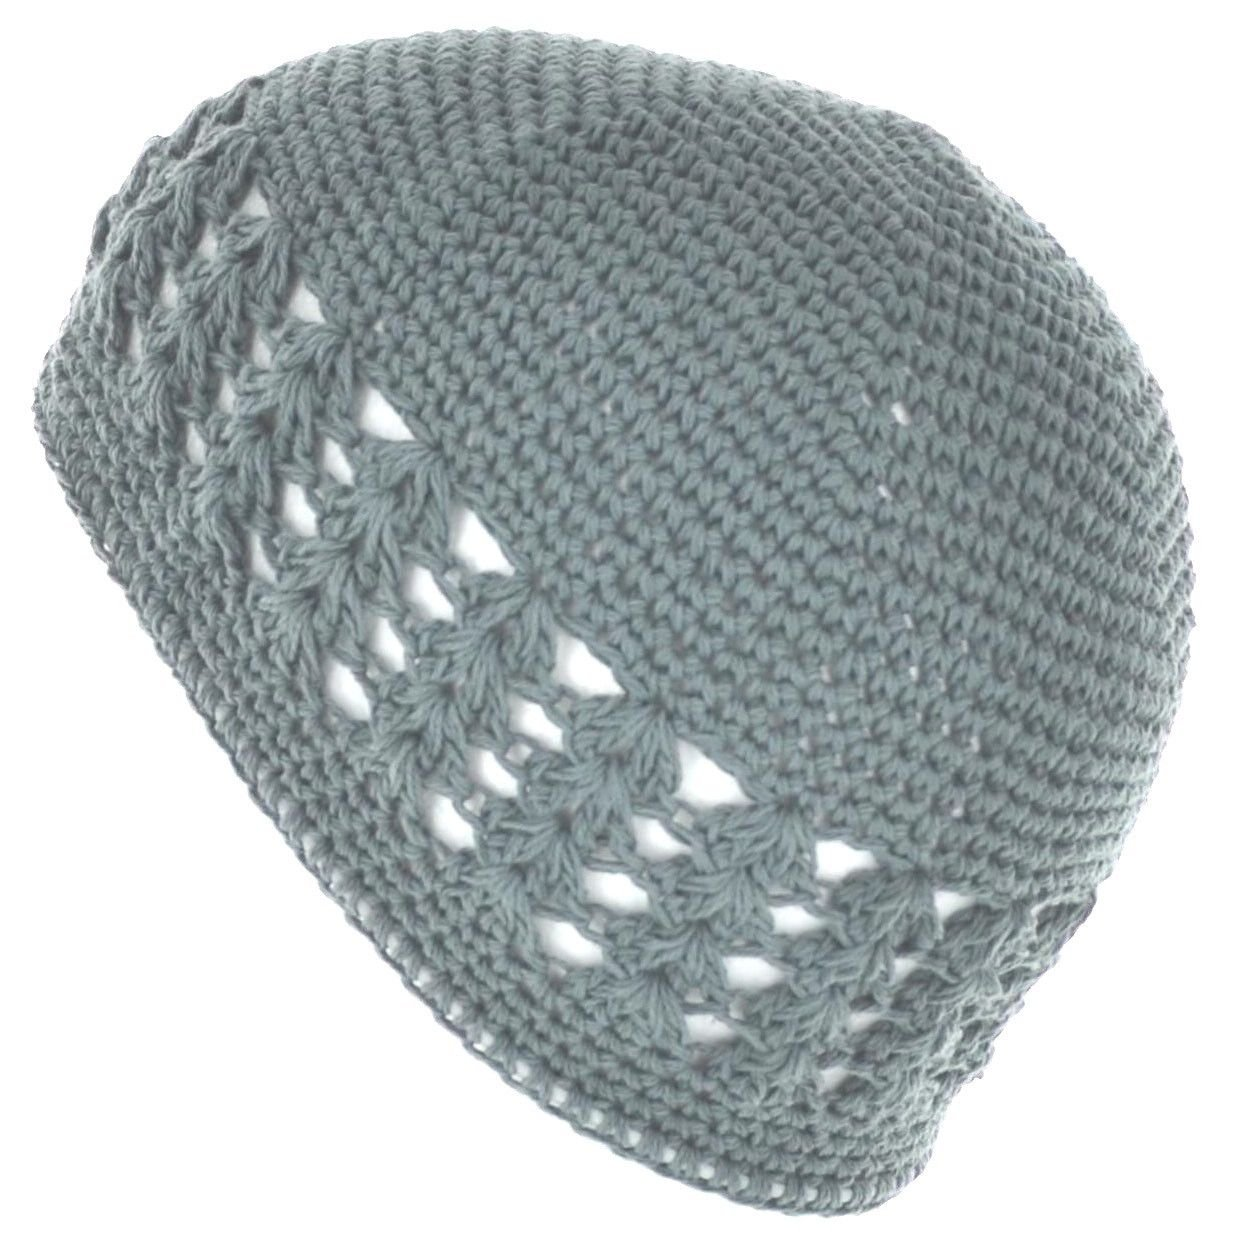 LJL Design 100% Cotton Kufi Crochet Beanie Skull Cap Knit Hat Brand New 19 Different Colors (Silver)